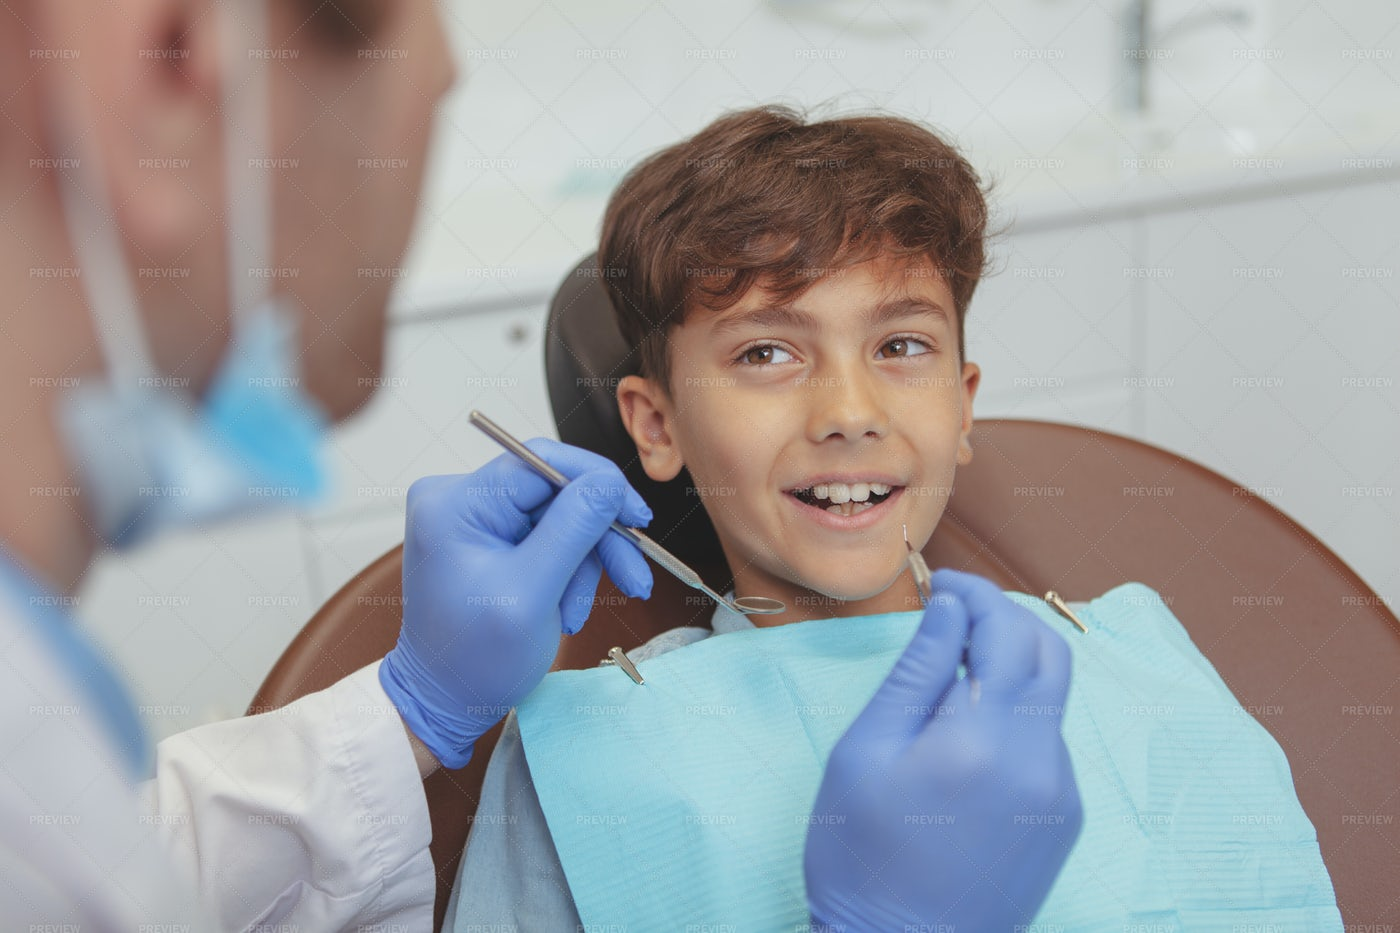 Kid Receives Dental Check-Up: Stock Photos